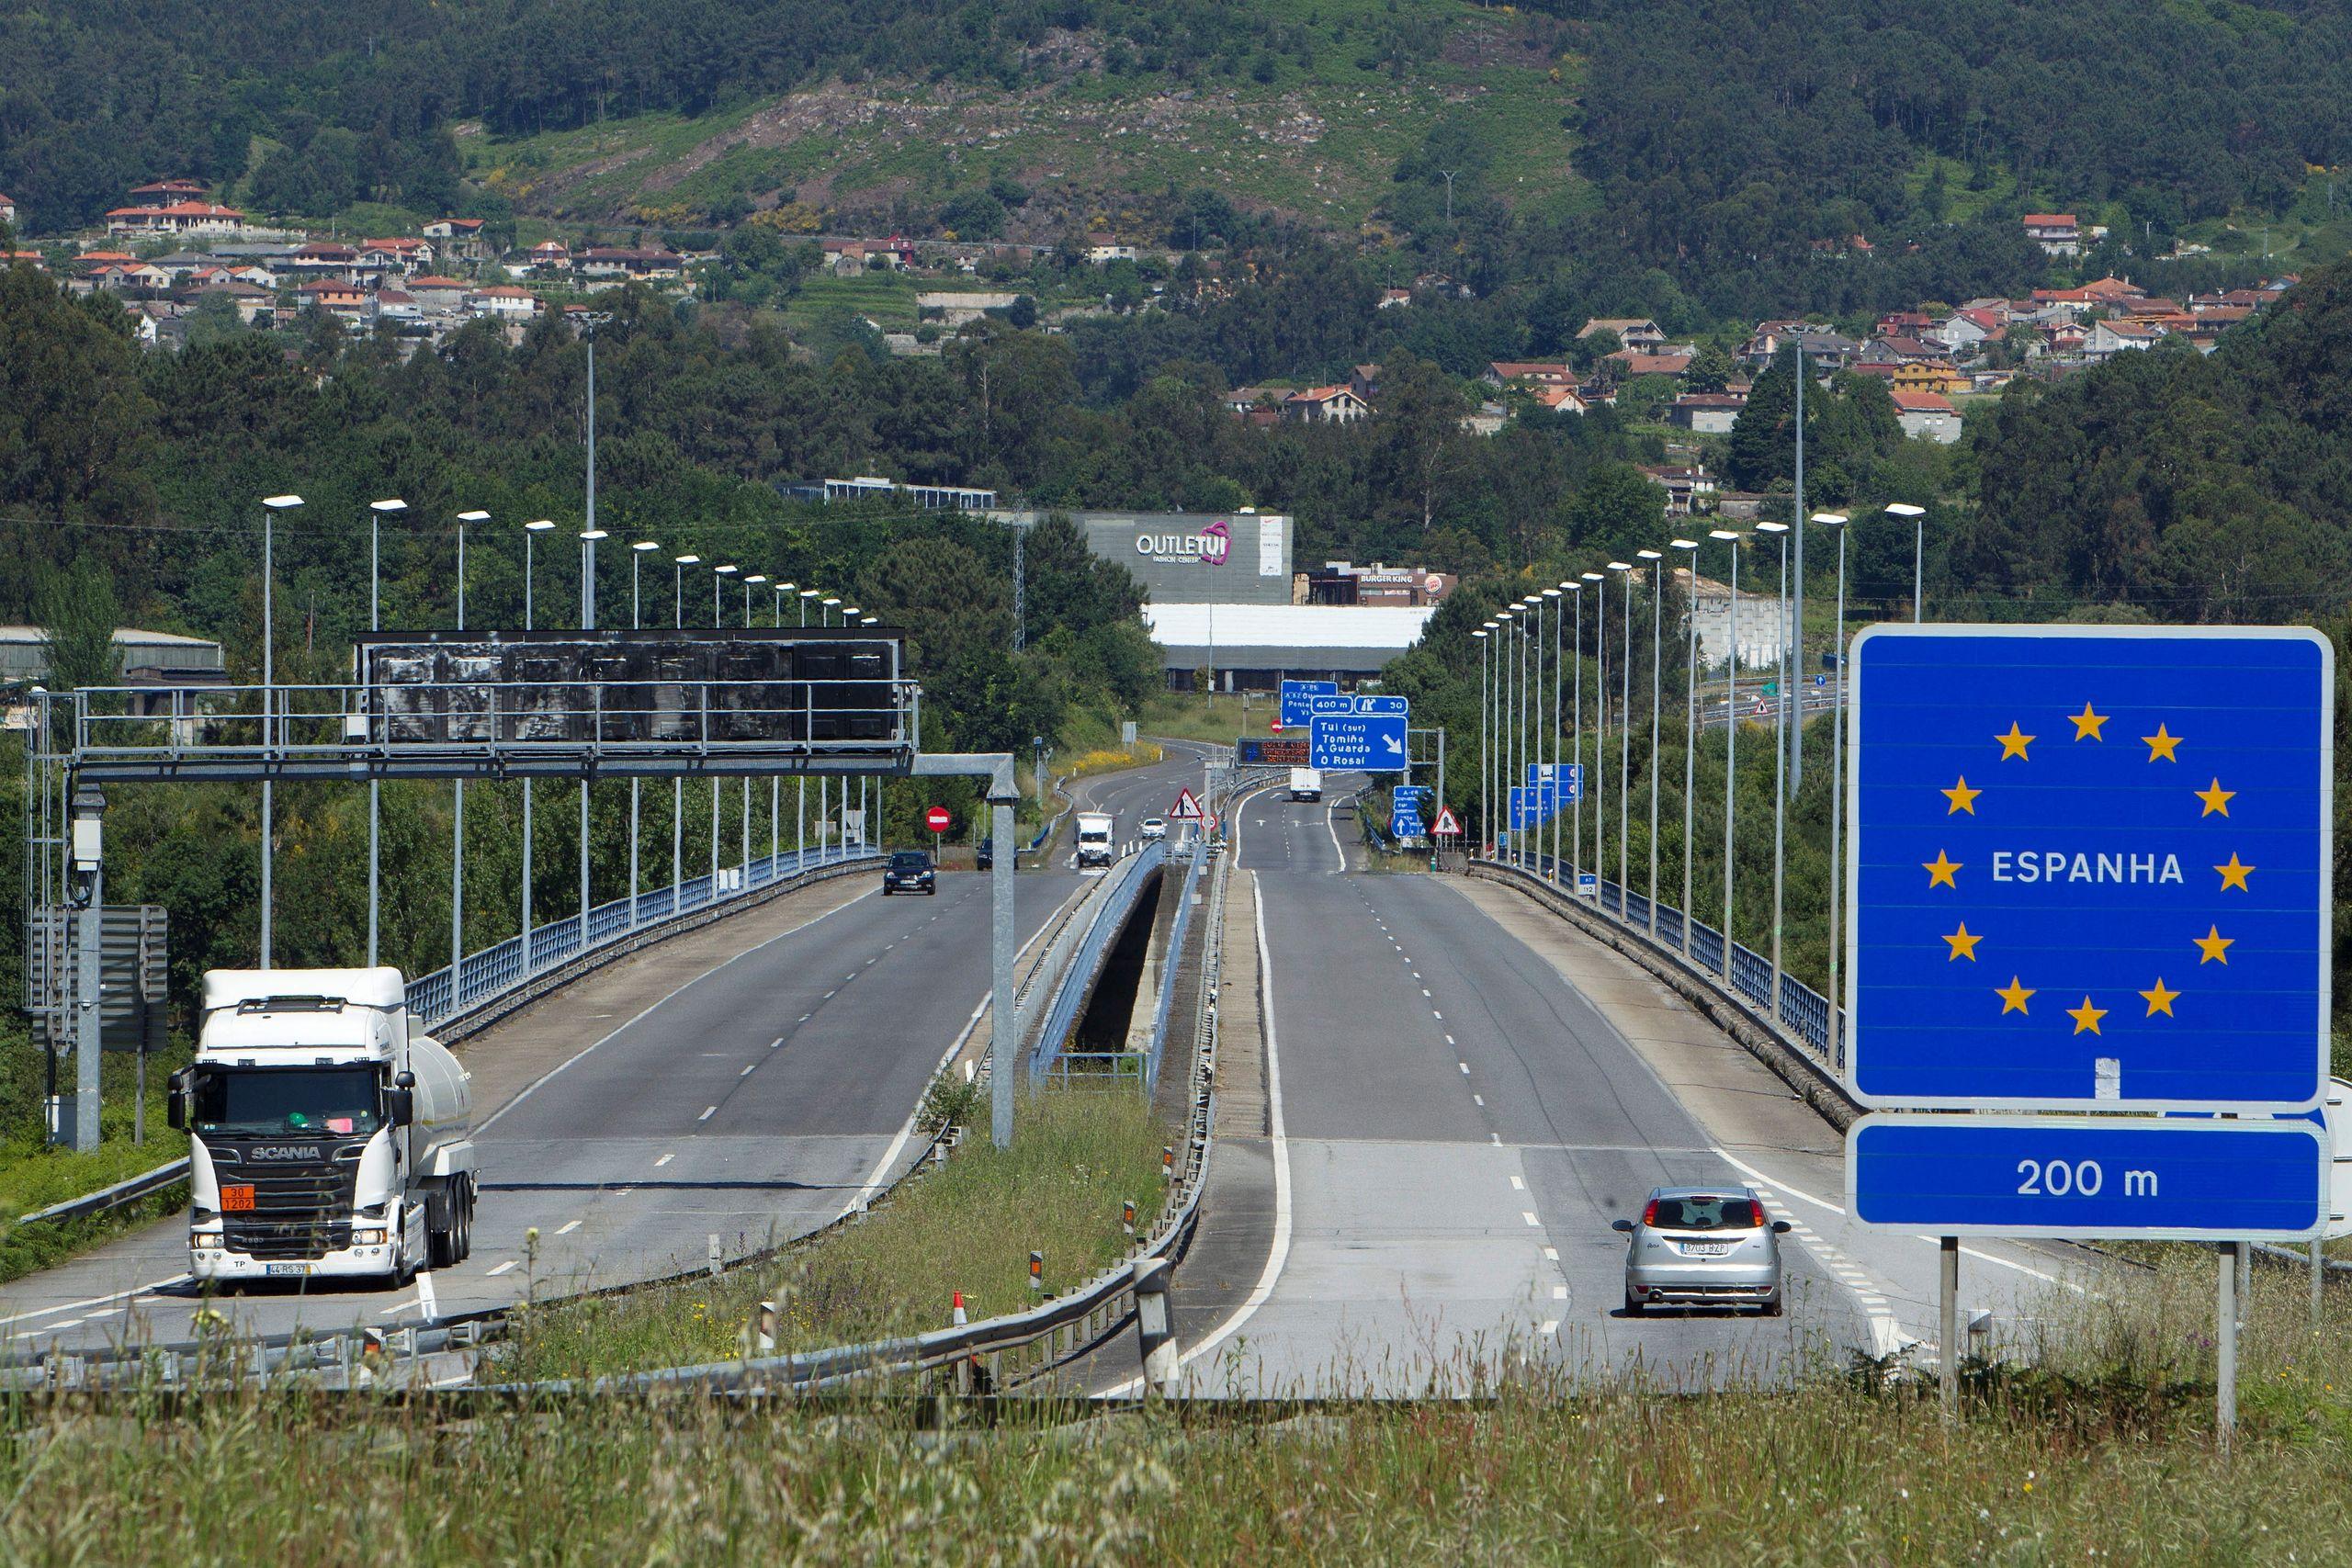 frontera-portugal-040521.jpg